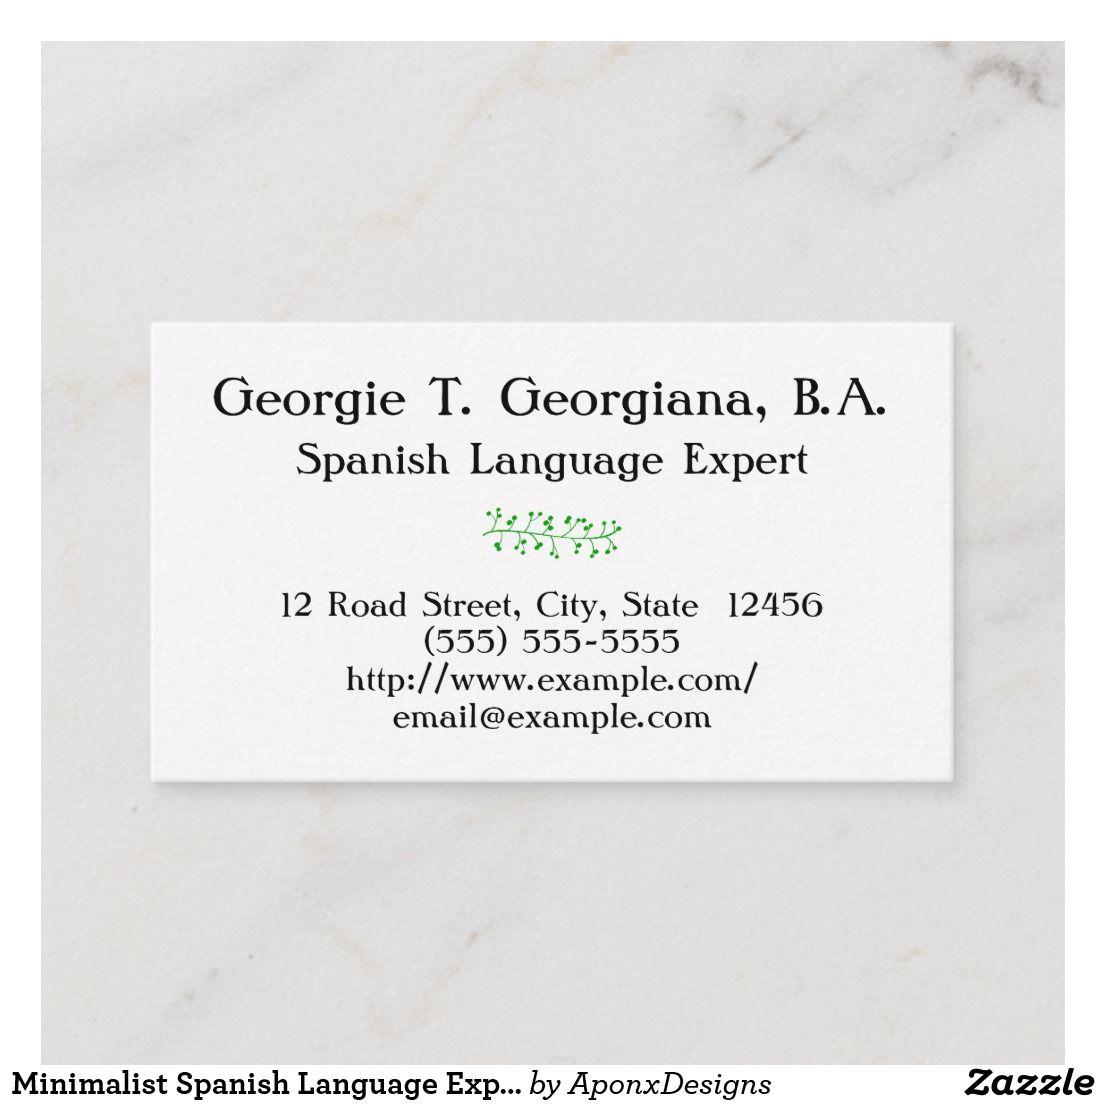 Minimalist Spanish Language Expert Business Card Zazzle Com